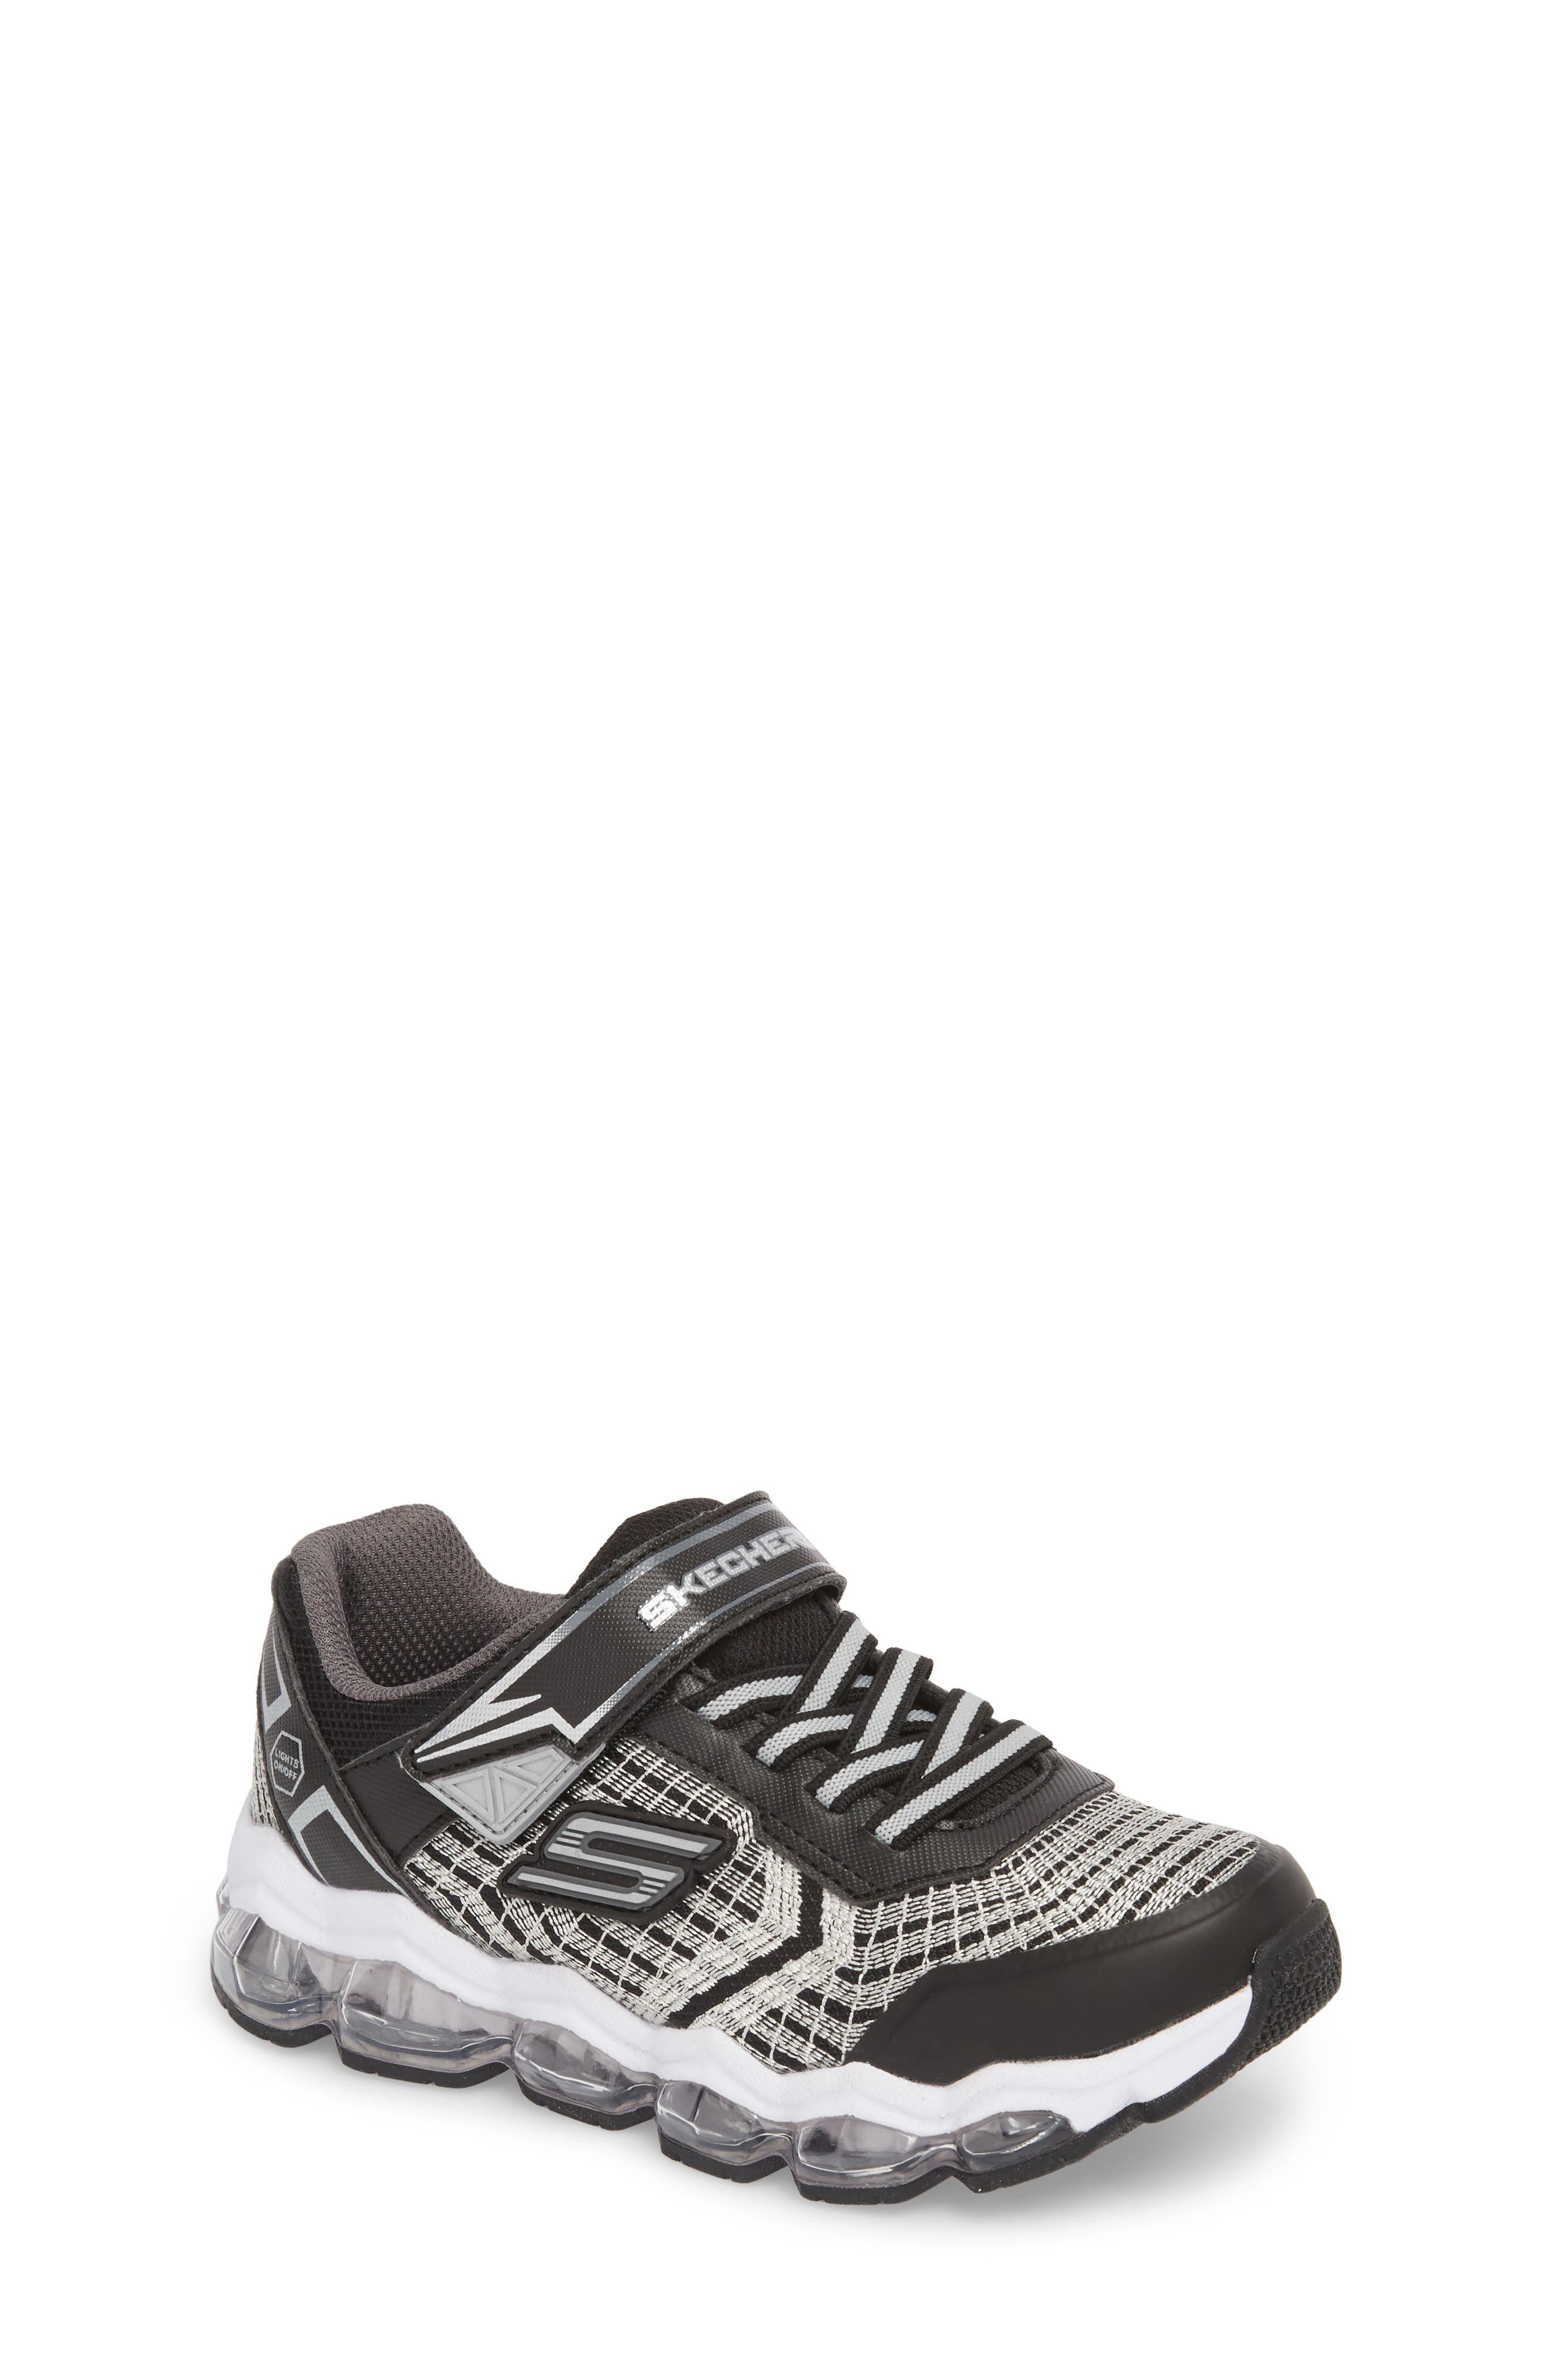 Energy Lights Sneaker,                             Main thumbnail 1, color,                             Black/ Silver